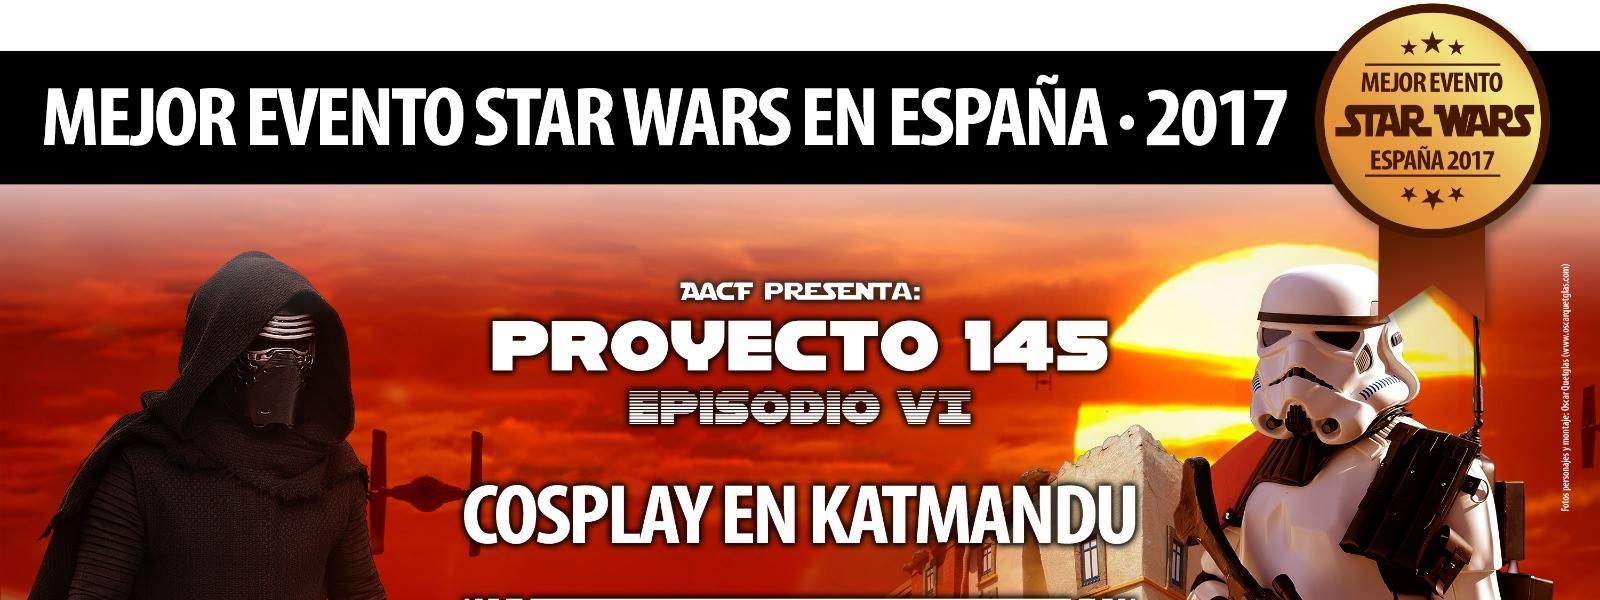 PREMIO AL MEJOR EVENTO STAR WARS ESPAÑA 2017!!!